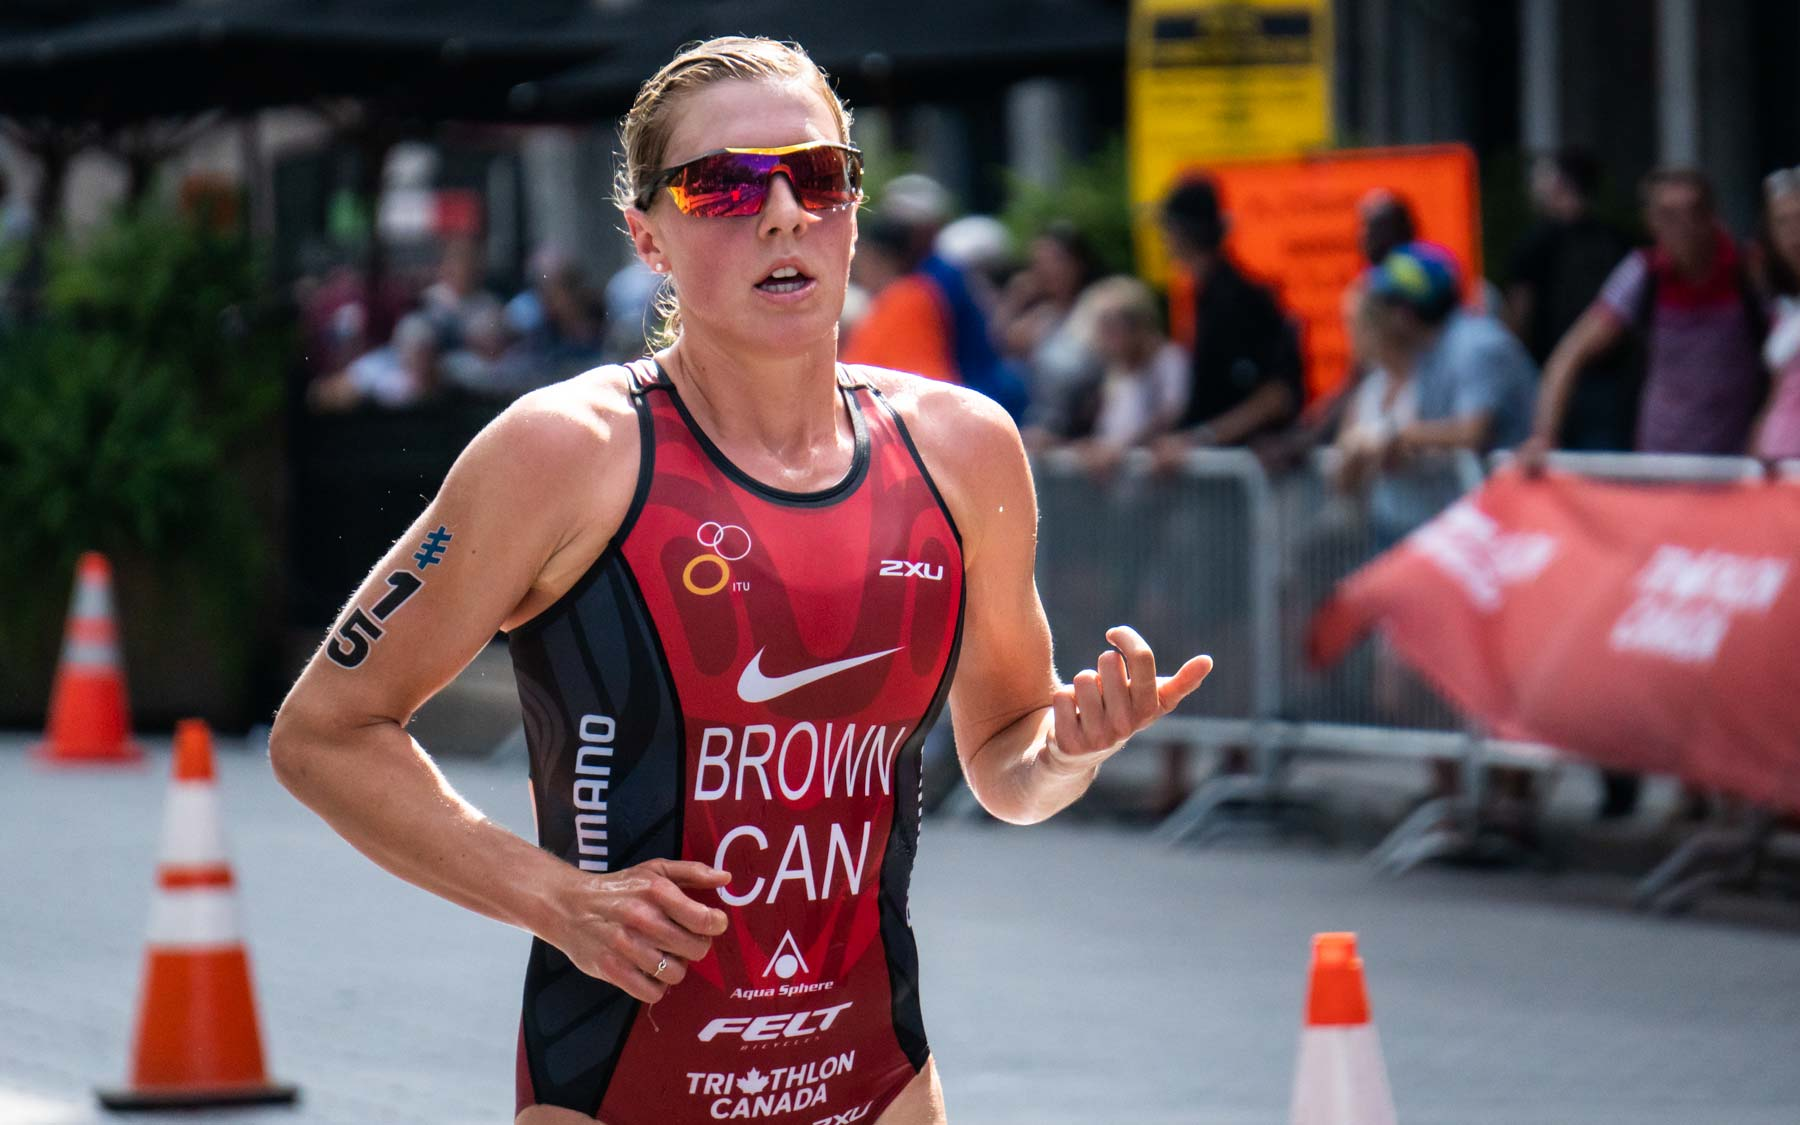 Jo Brown into fourth.